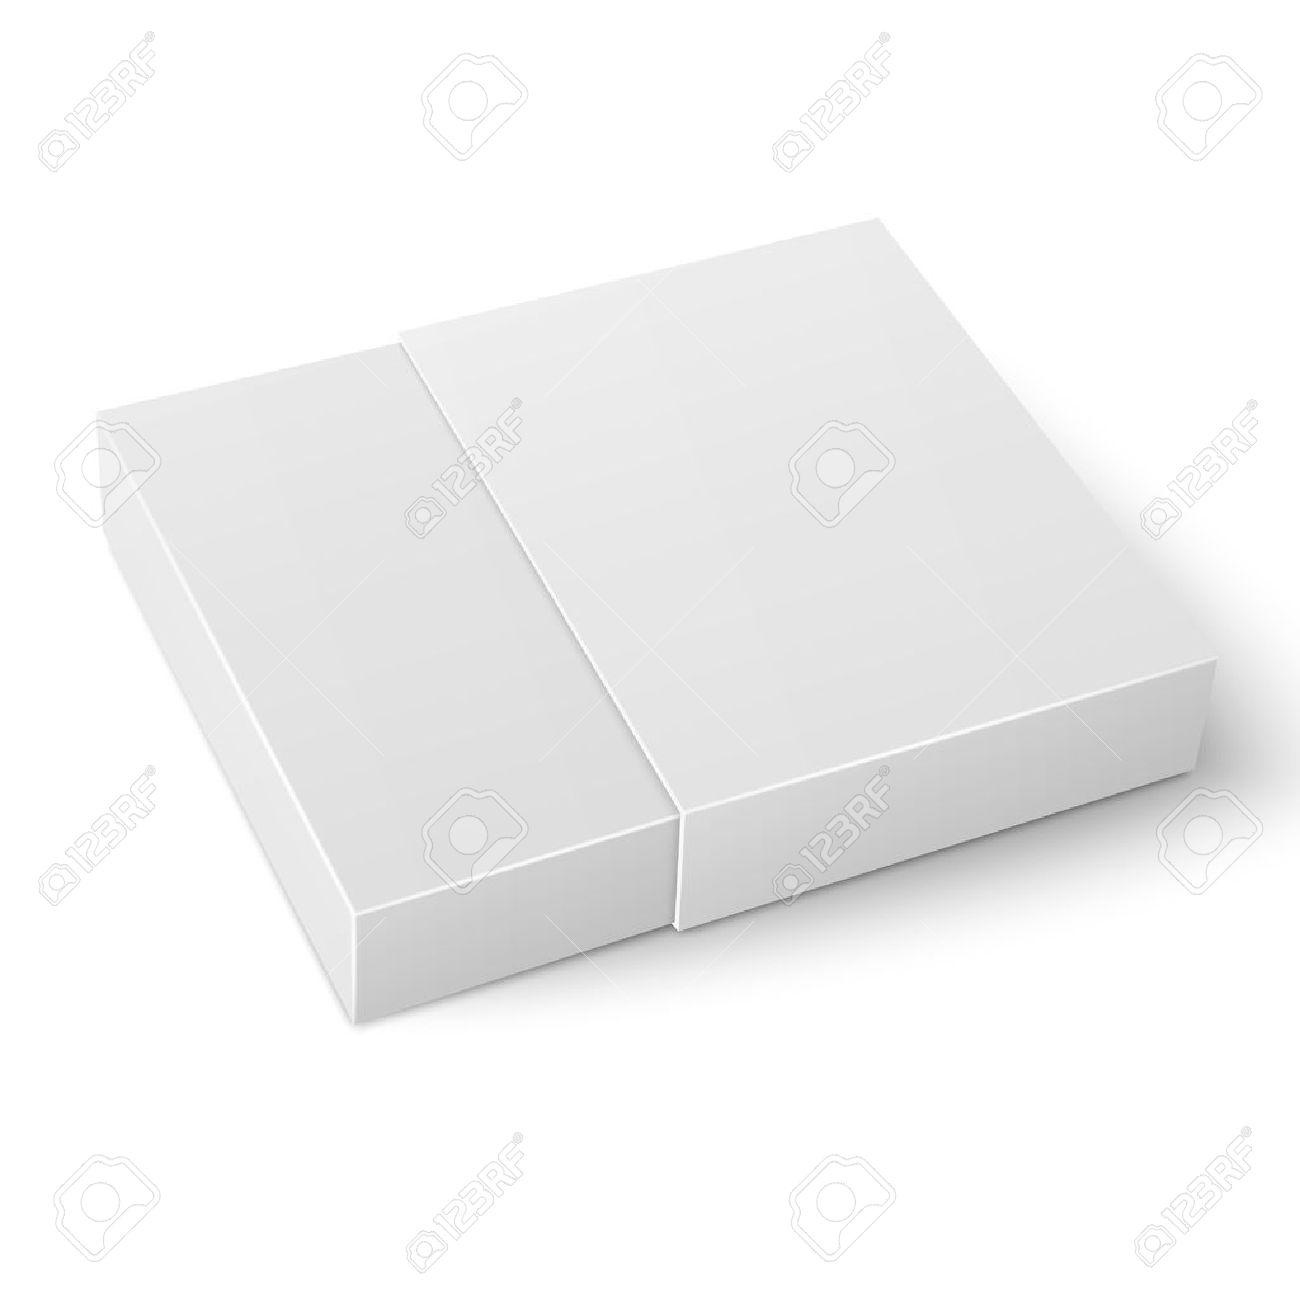 white sliding cardboard box template on white background packaging